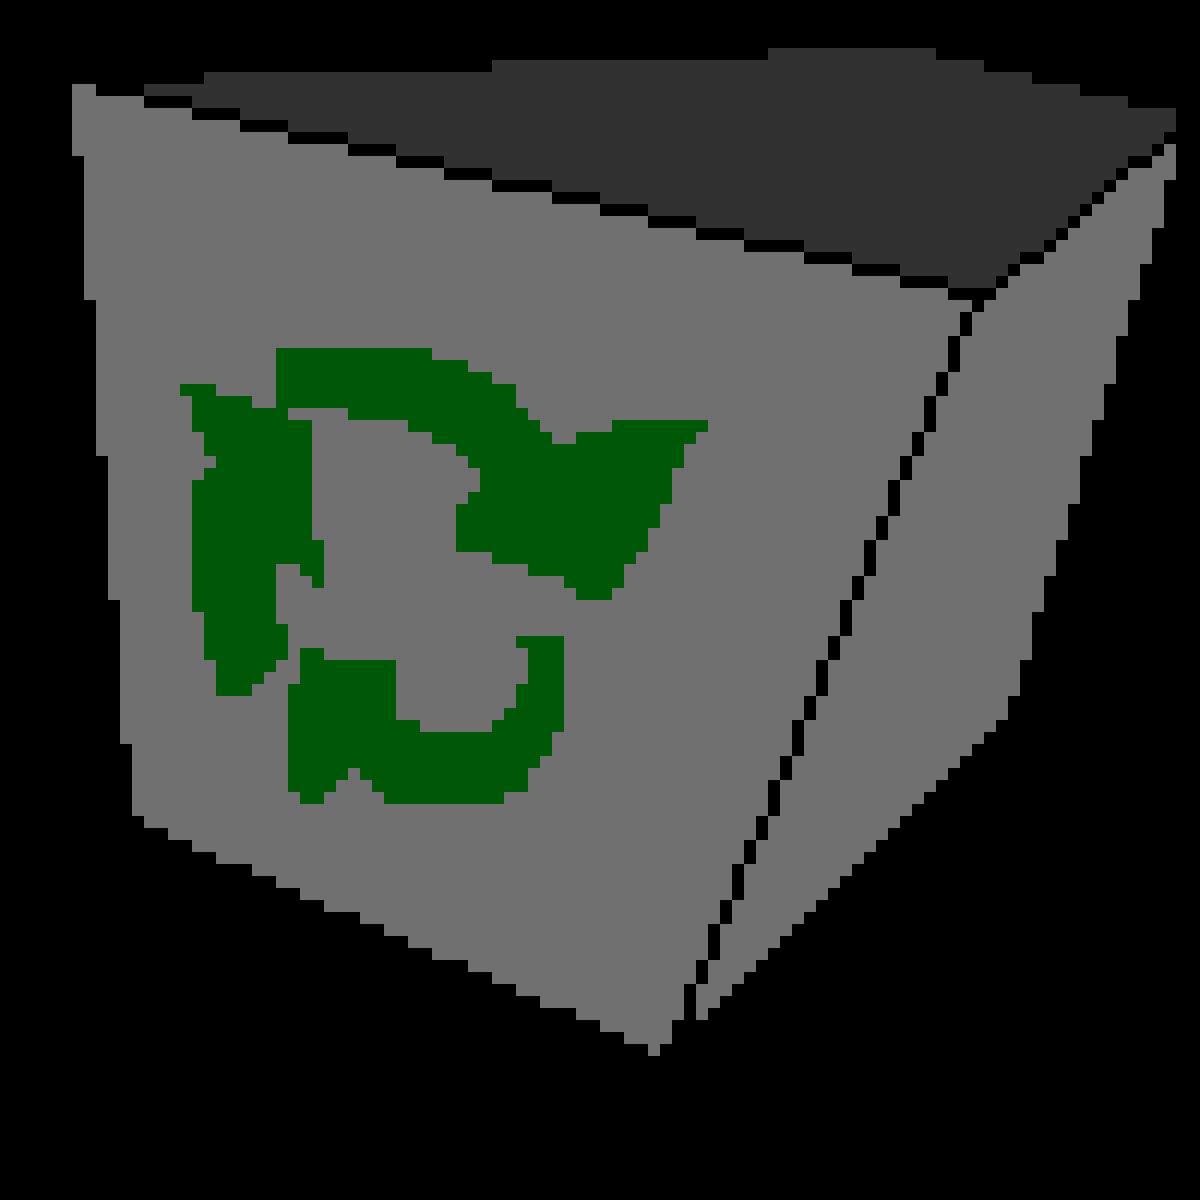 Recycle bin icon by Derickalex